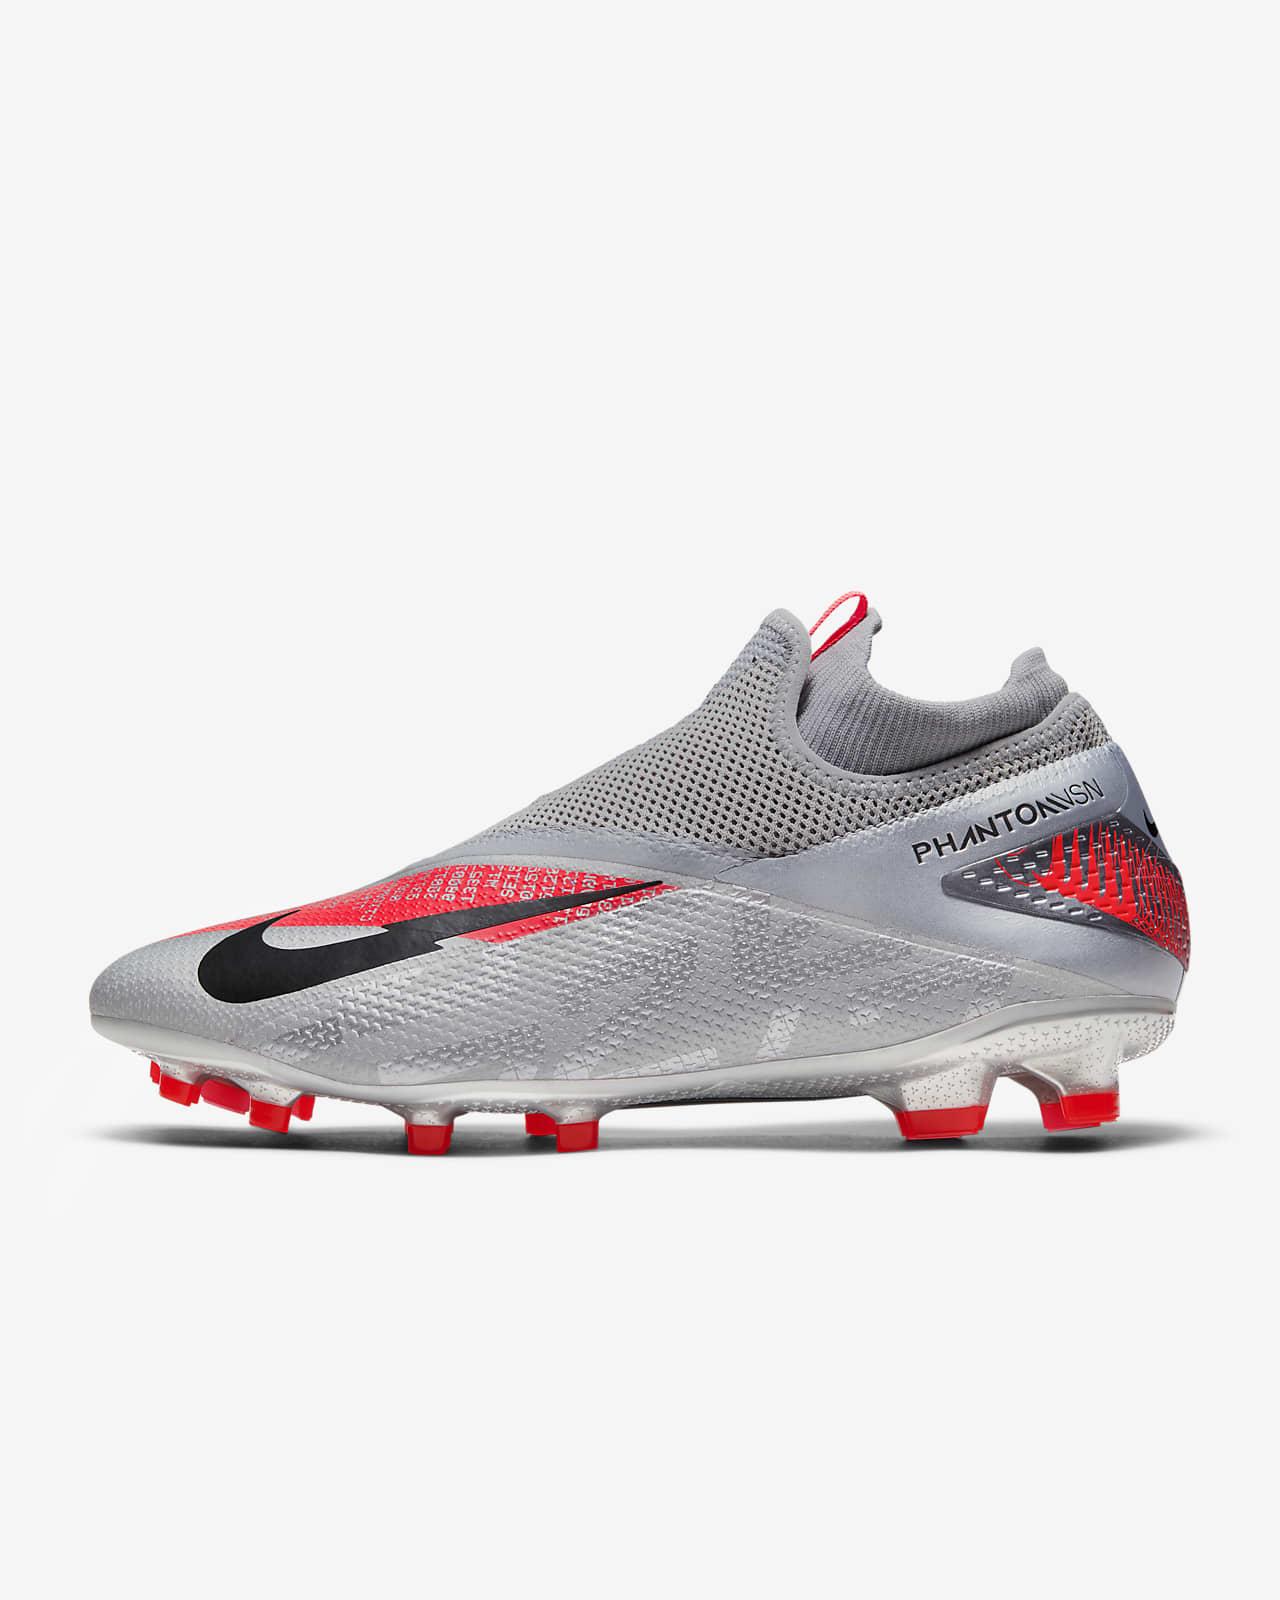 Nike Phantom Vision 2 Pro Dynamic Fit FG Firm Ground Football Boot